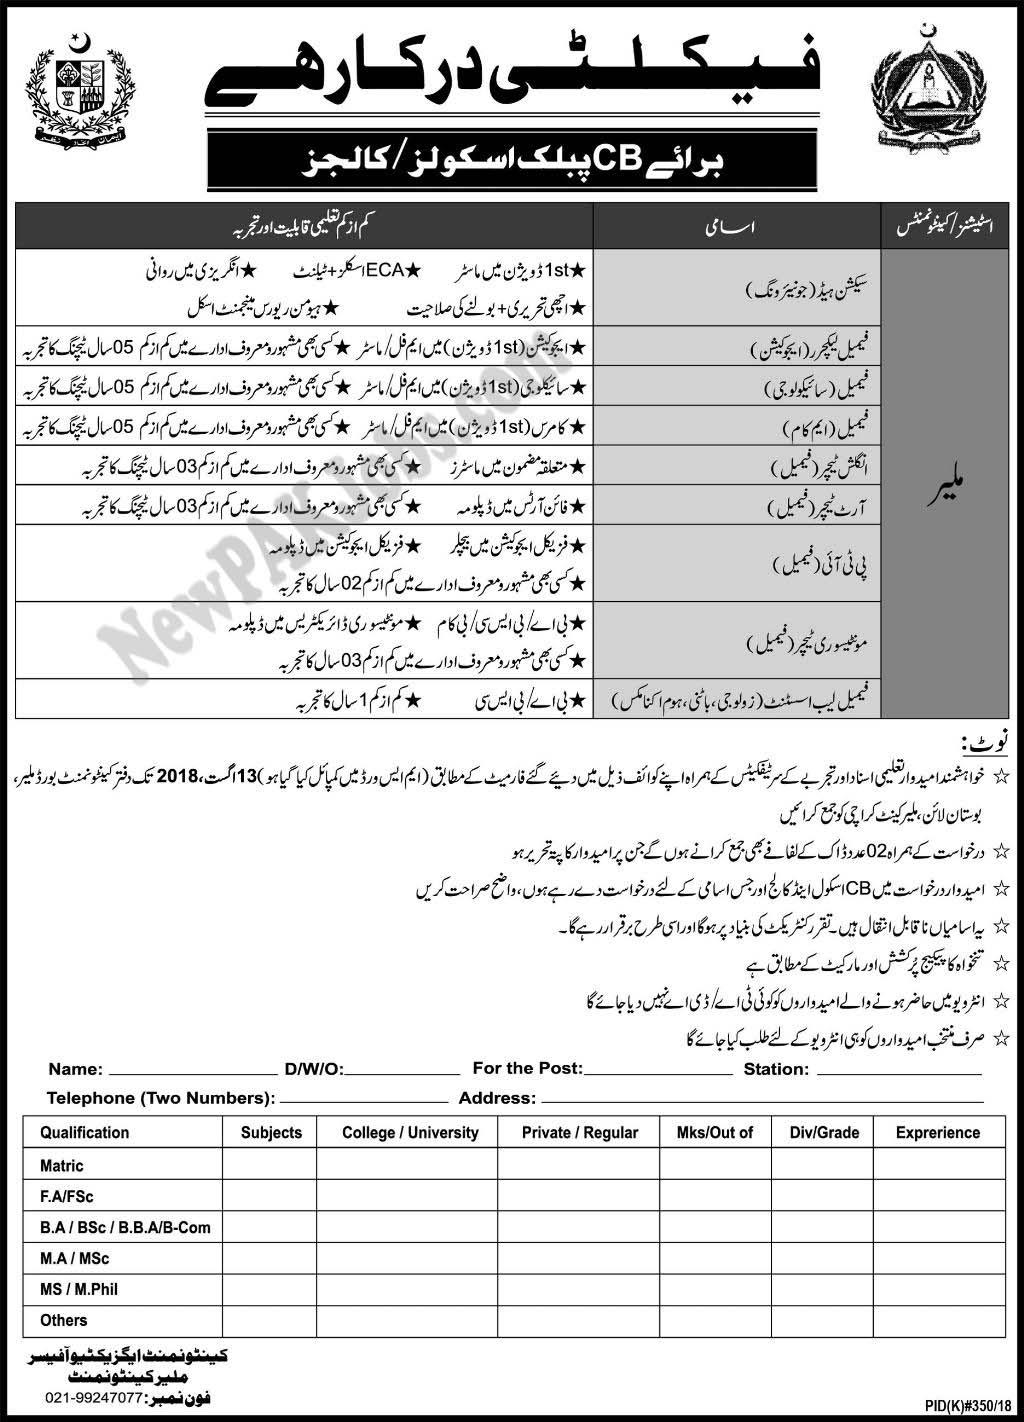 malir-karachi-jobs